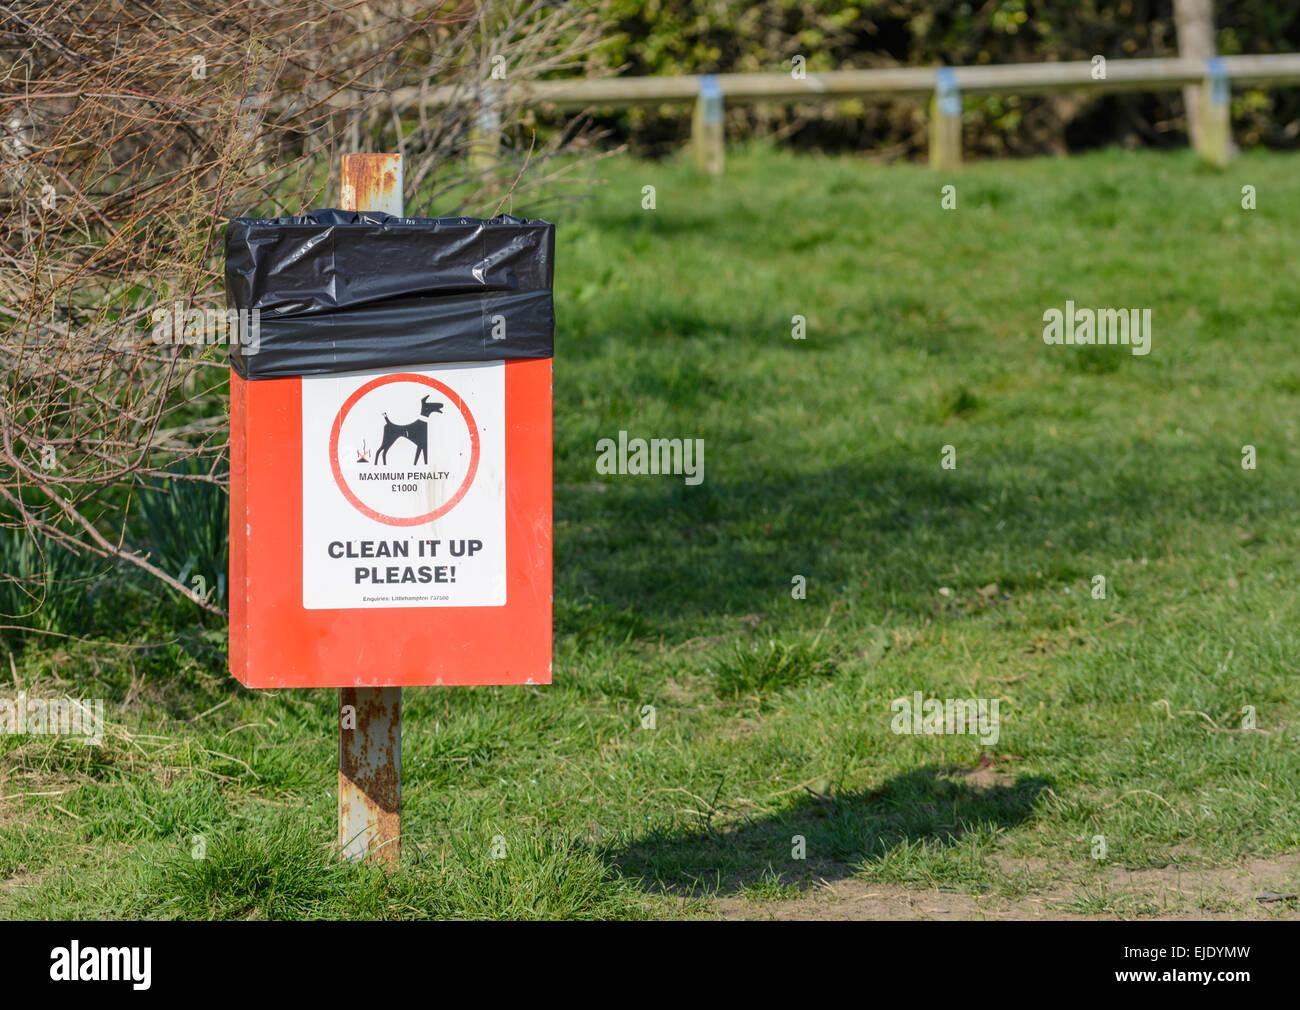 Dog waste bin in a park in the UK. - Stock Image